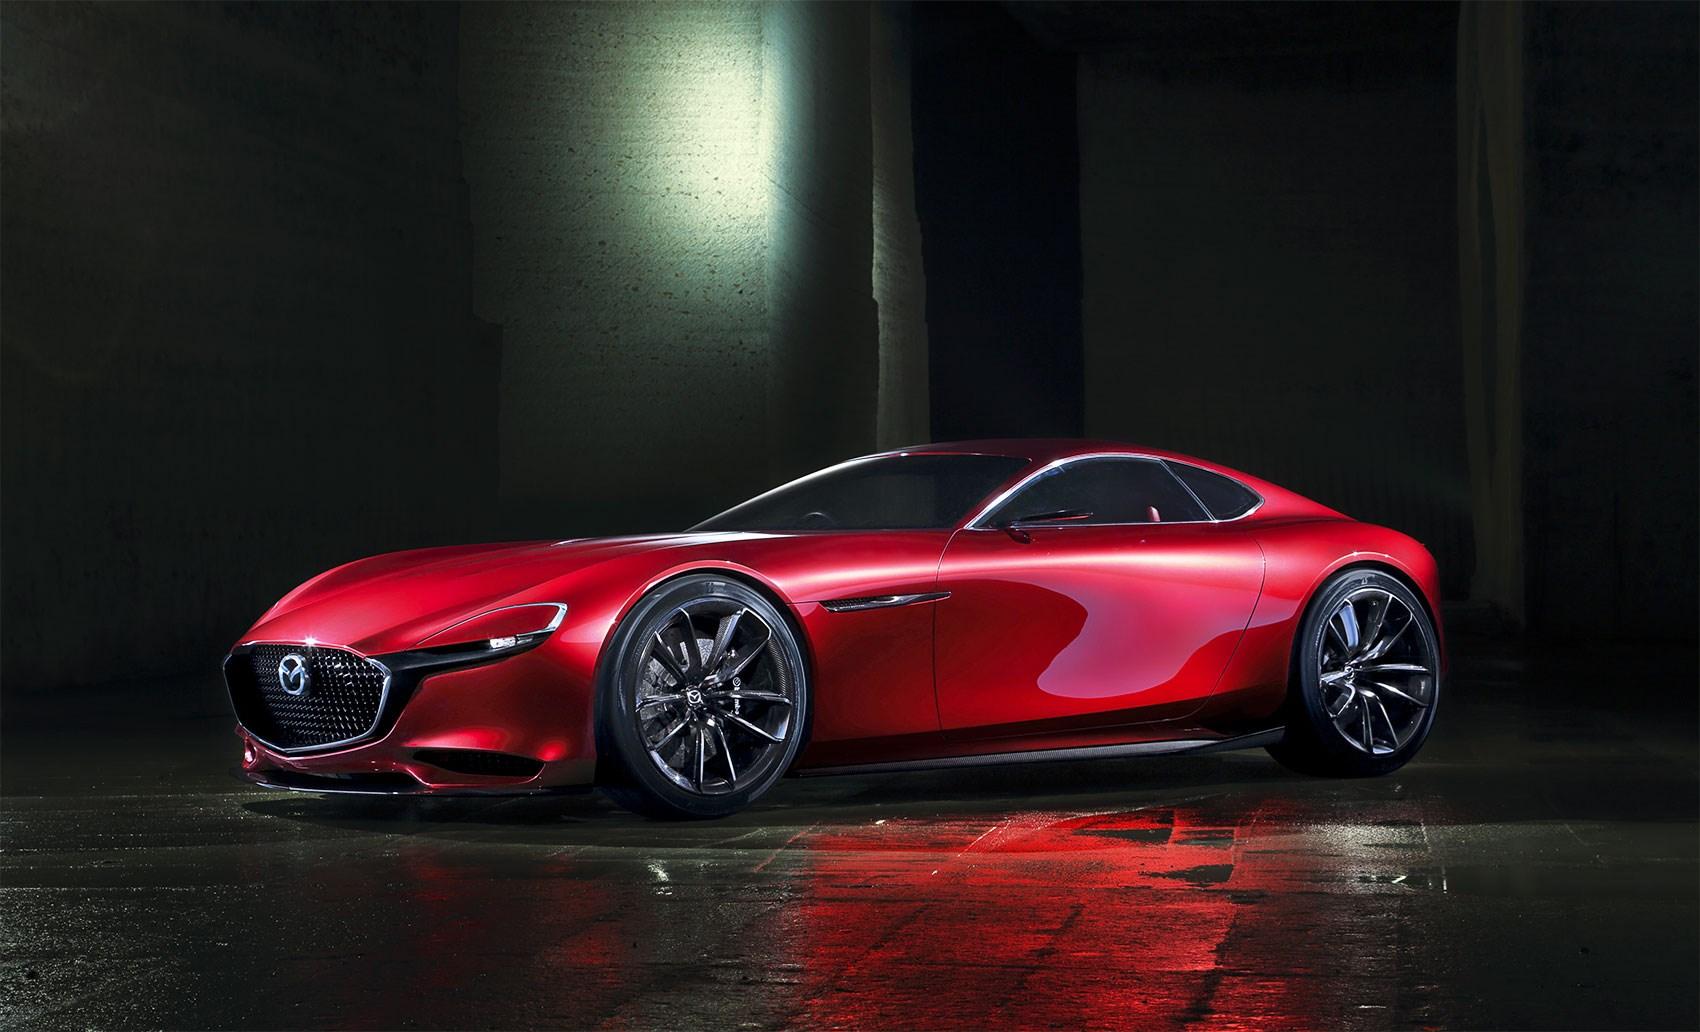 New Rx 7 Mazda S Rotary Renaissance Car December 2015